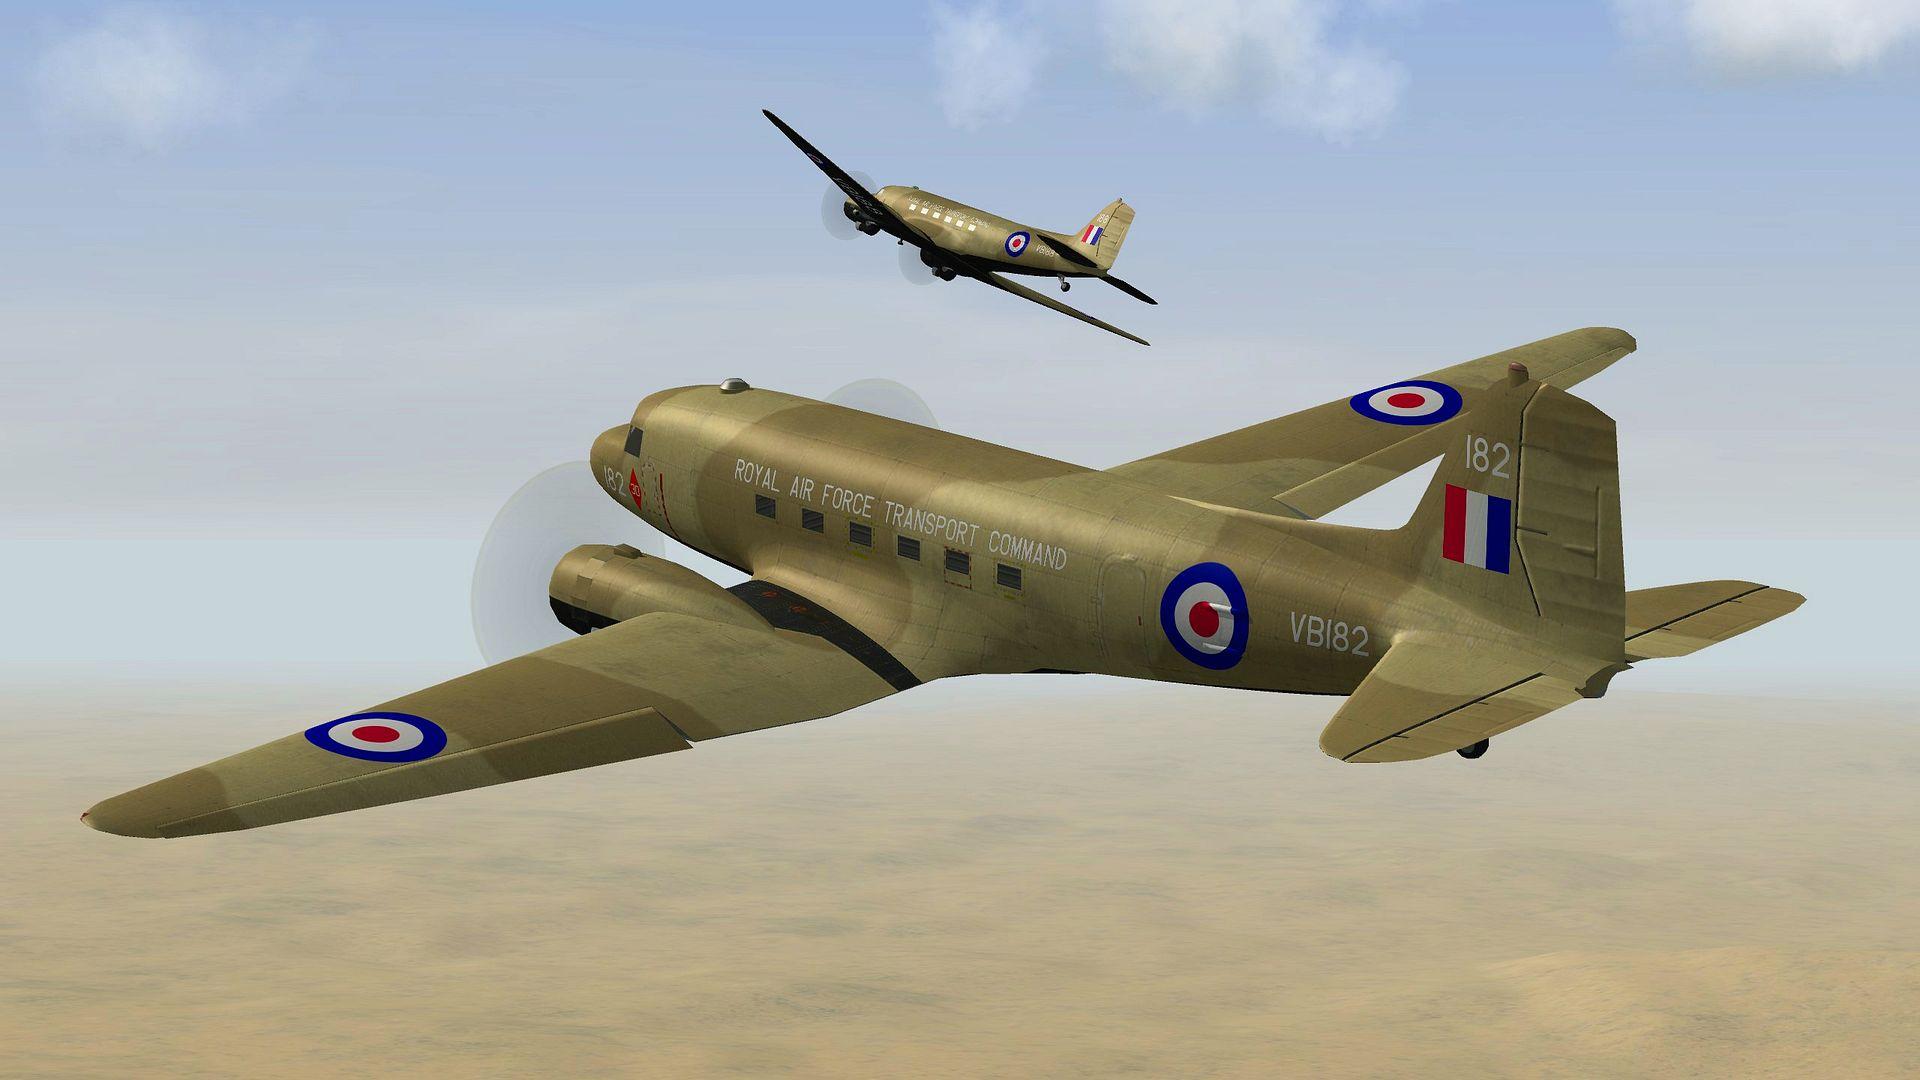 RAF%20DAKOTA%20C3.06_zpsj90wcoro.jpg